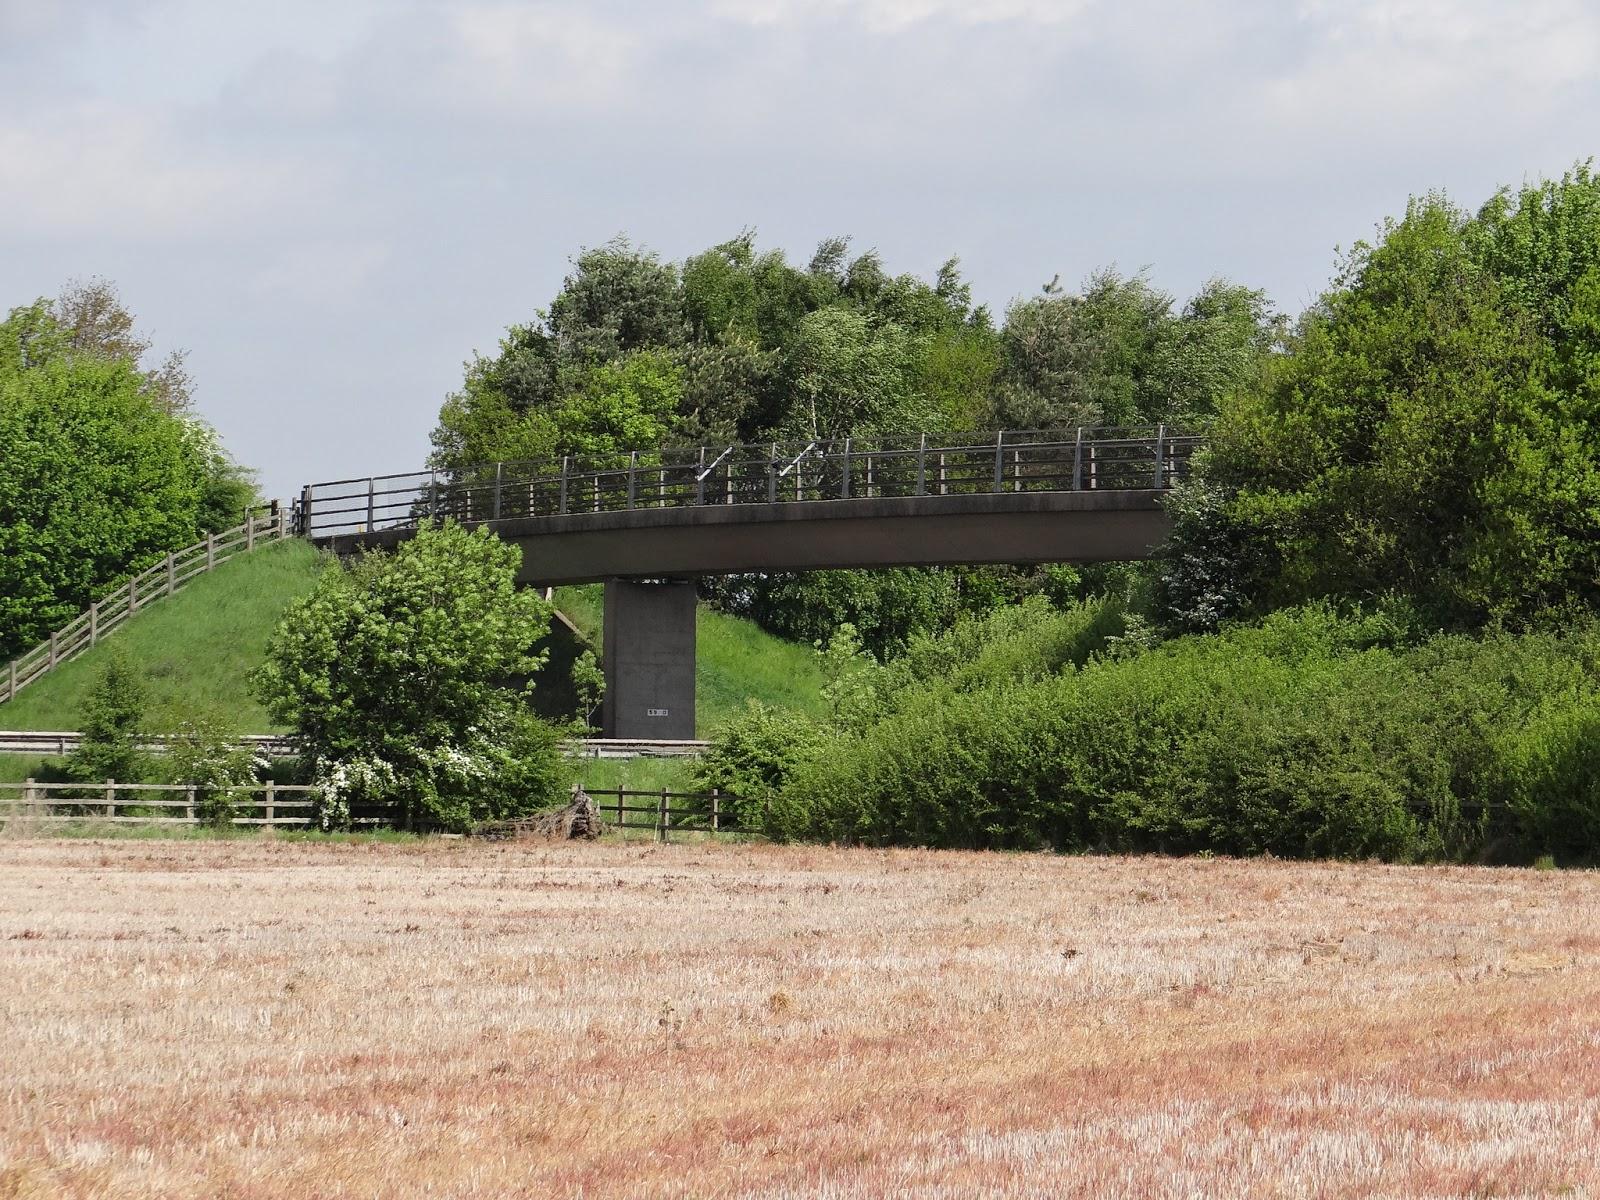 Bridge Over the M42